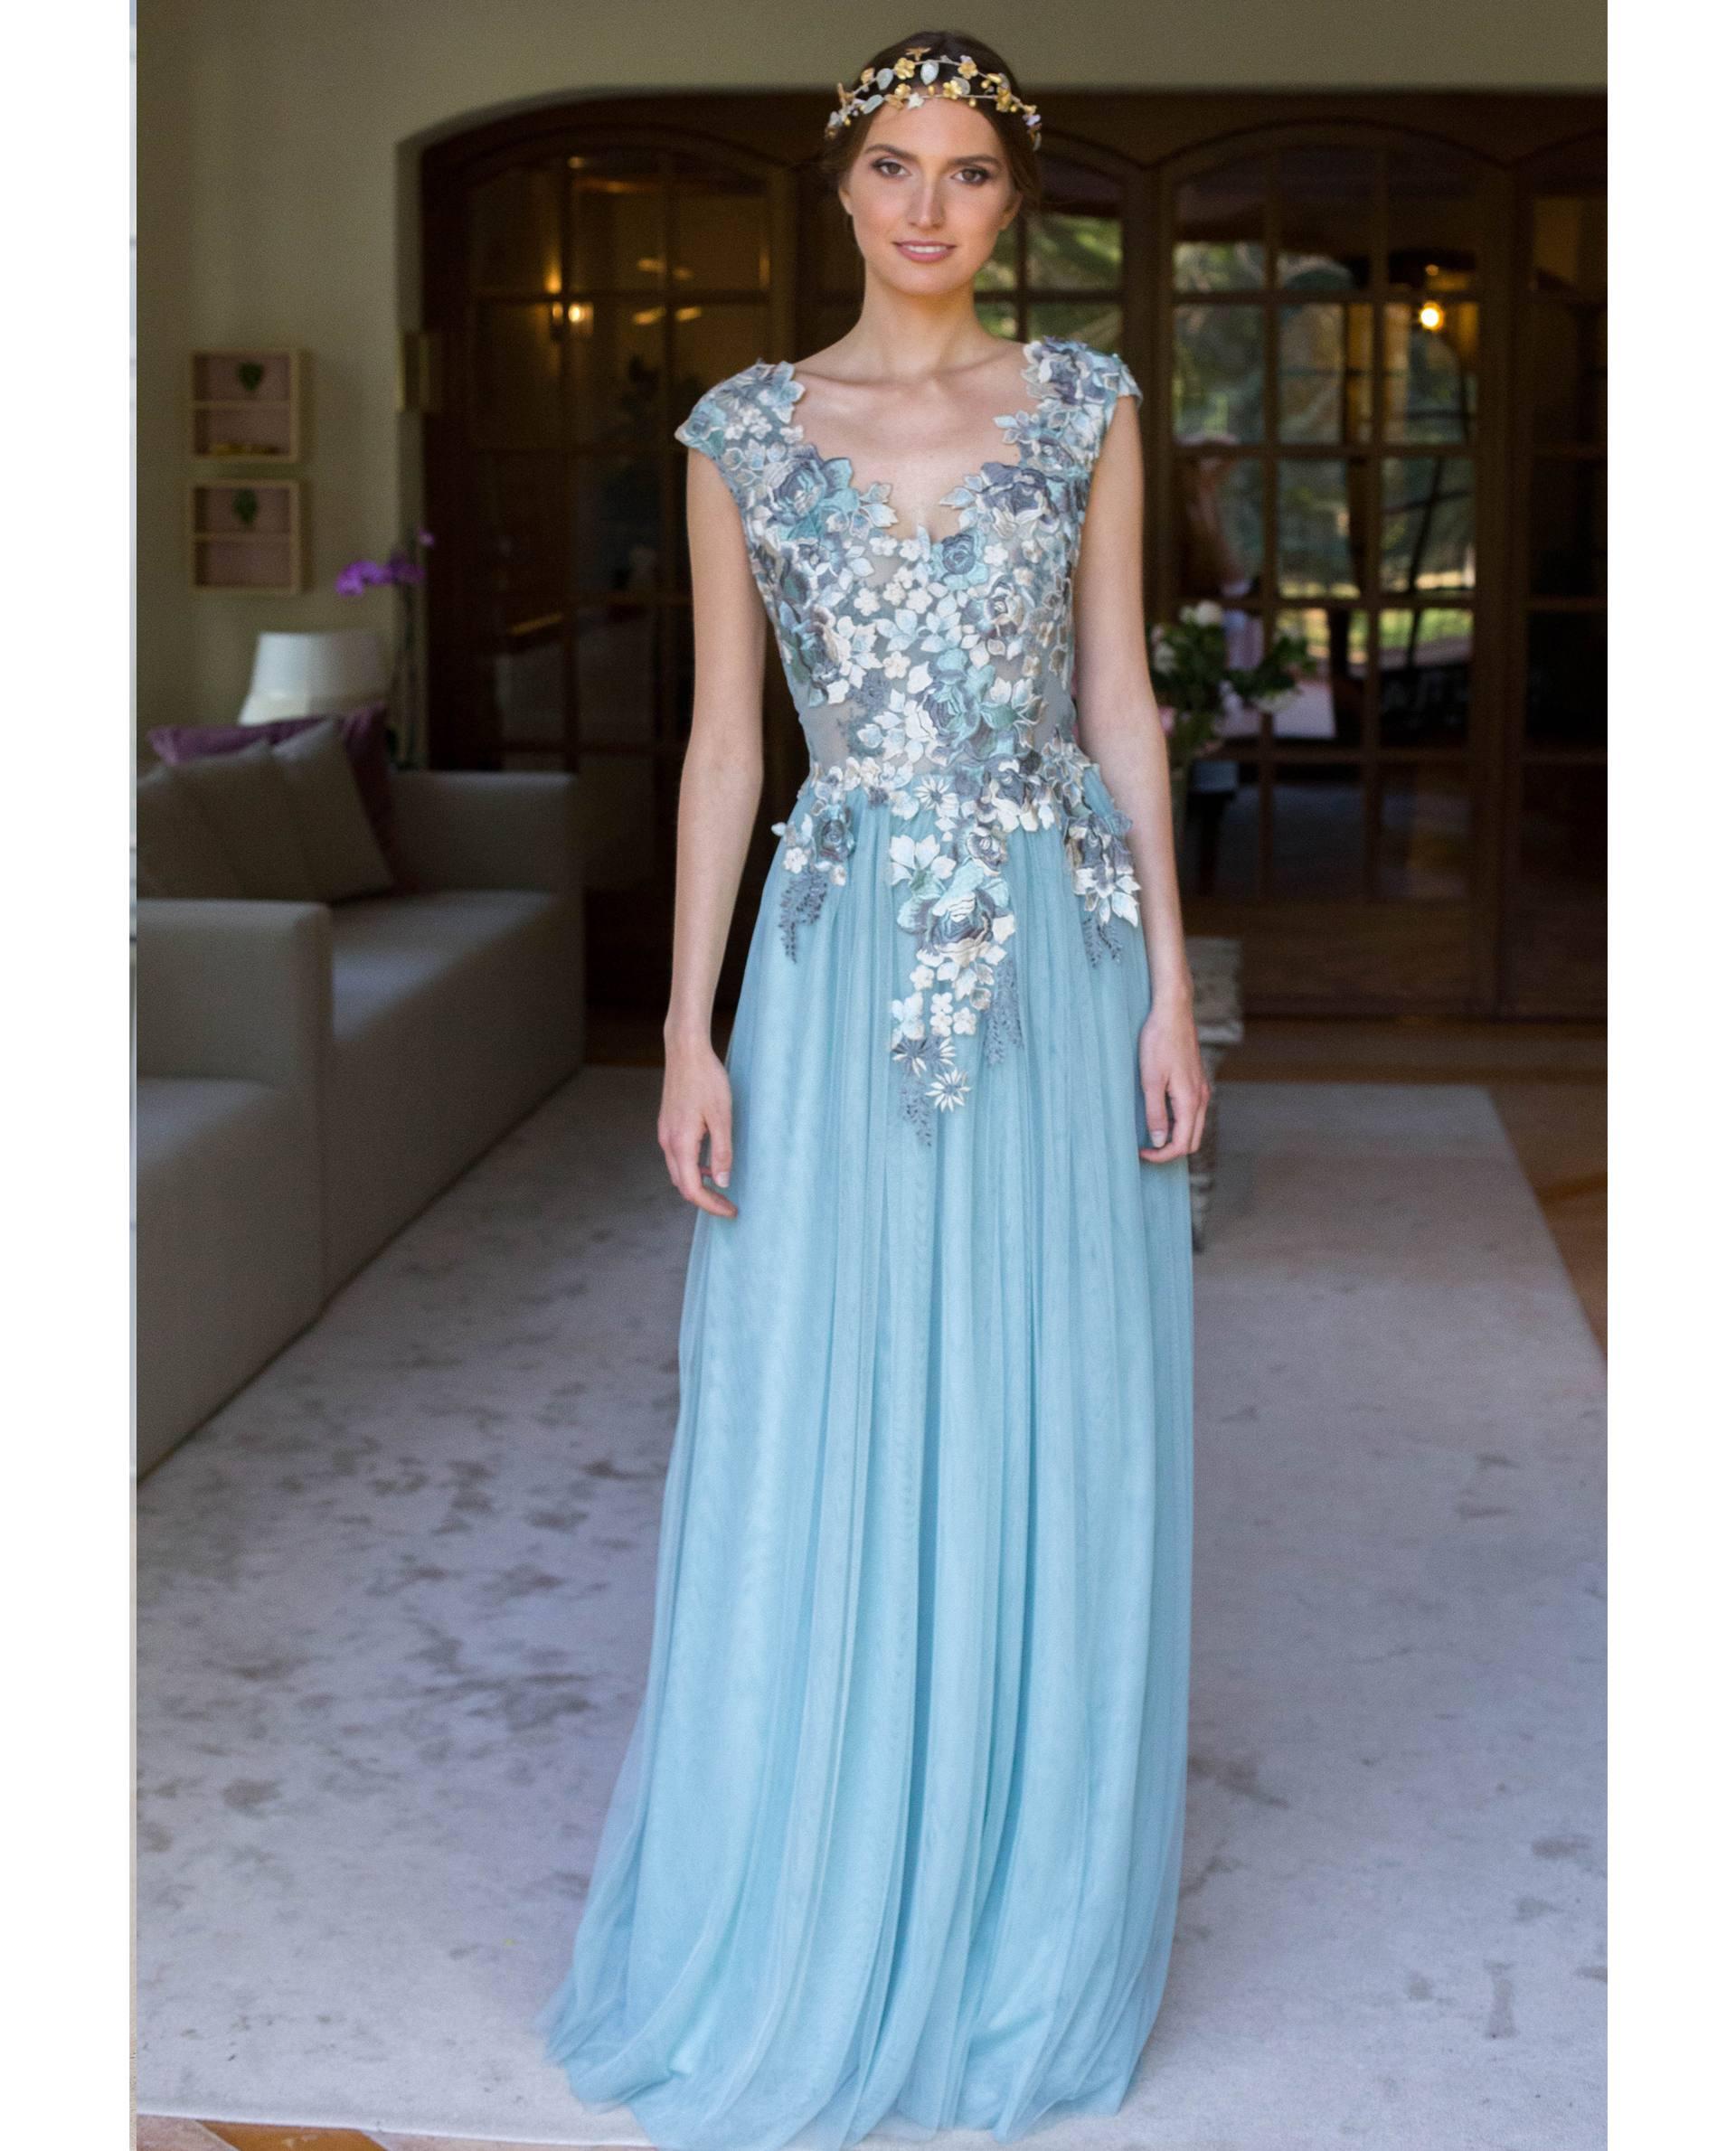 ATELIER-NATURE 2019 - VESTIDOS - vestido fiesta JOSÉPHINE azul